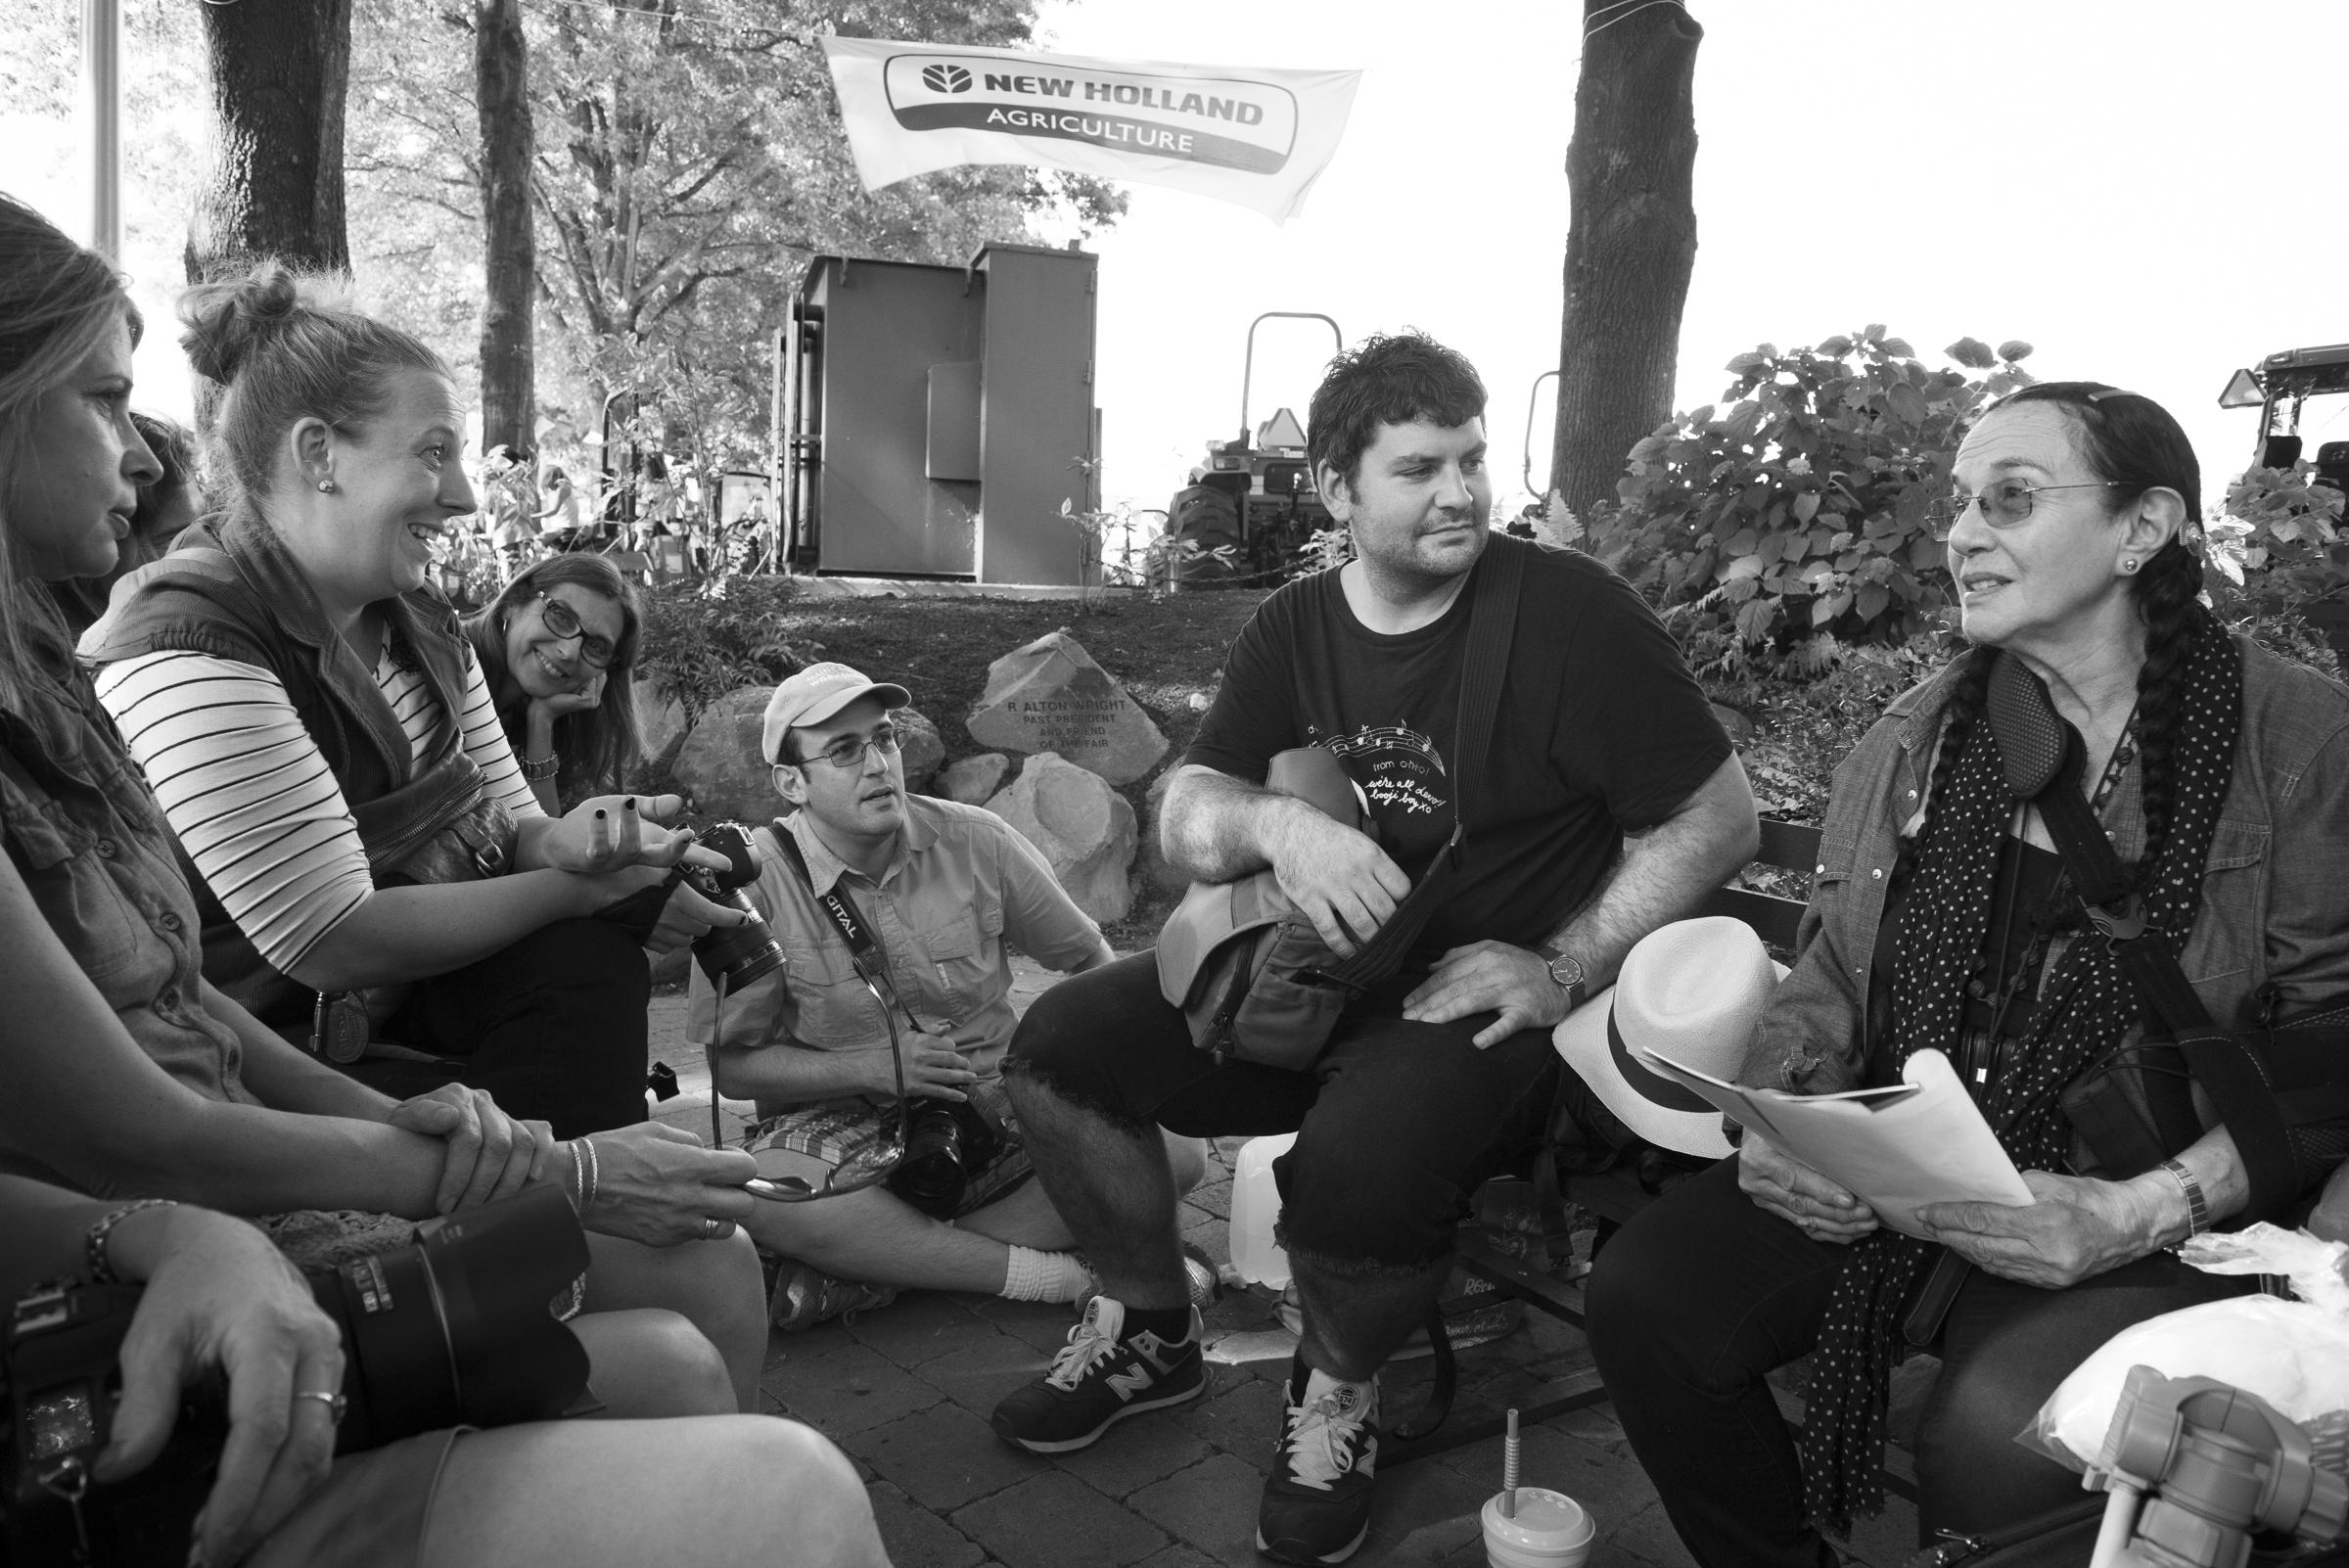 08252013-CarnivalScene-JuliaLuckettPhotography-14